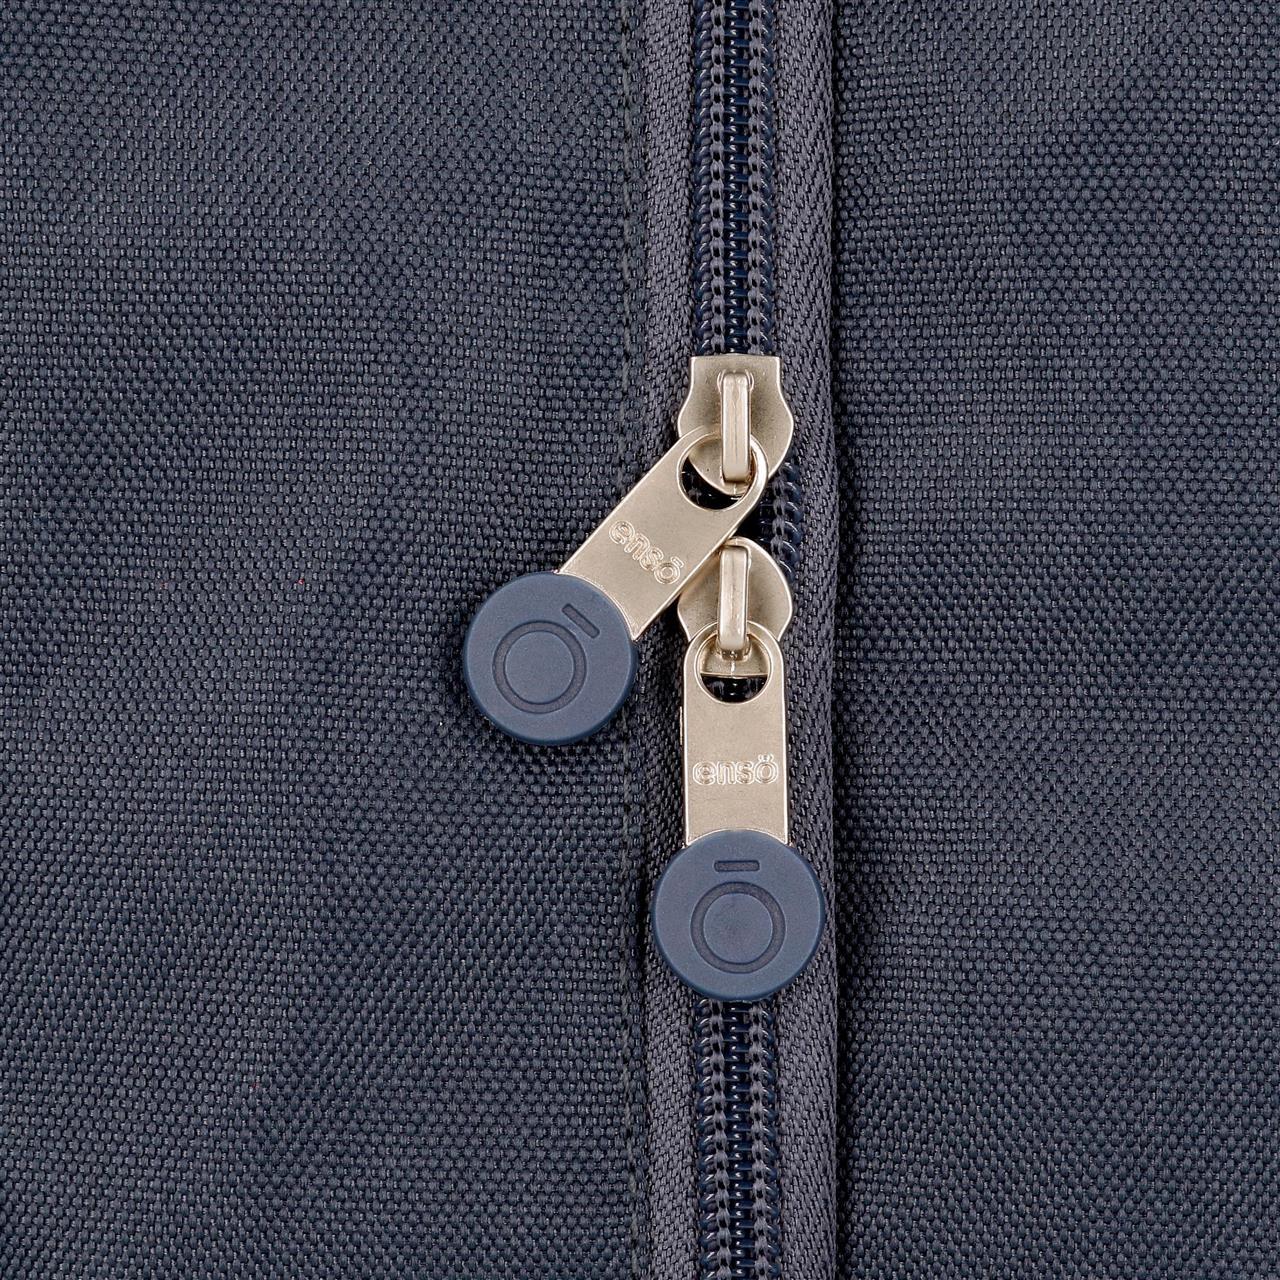 Mochila doble compartimento Enso Basic Azul